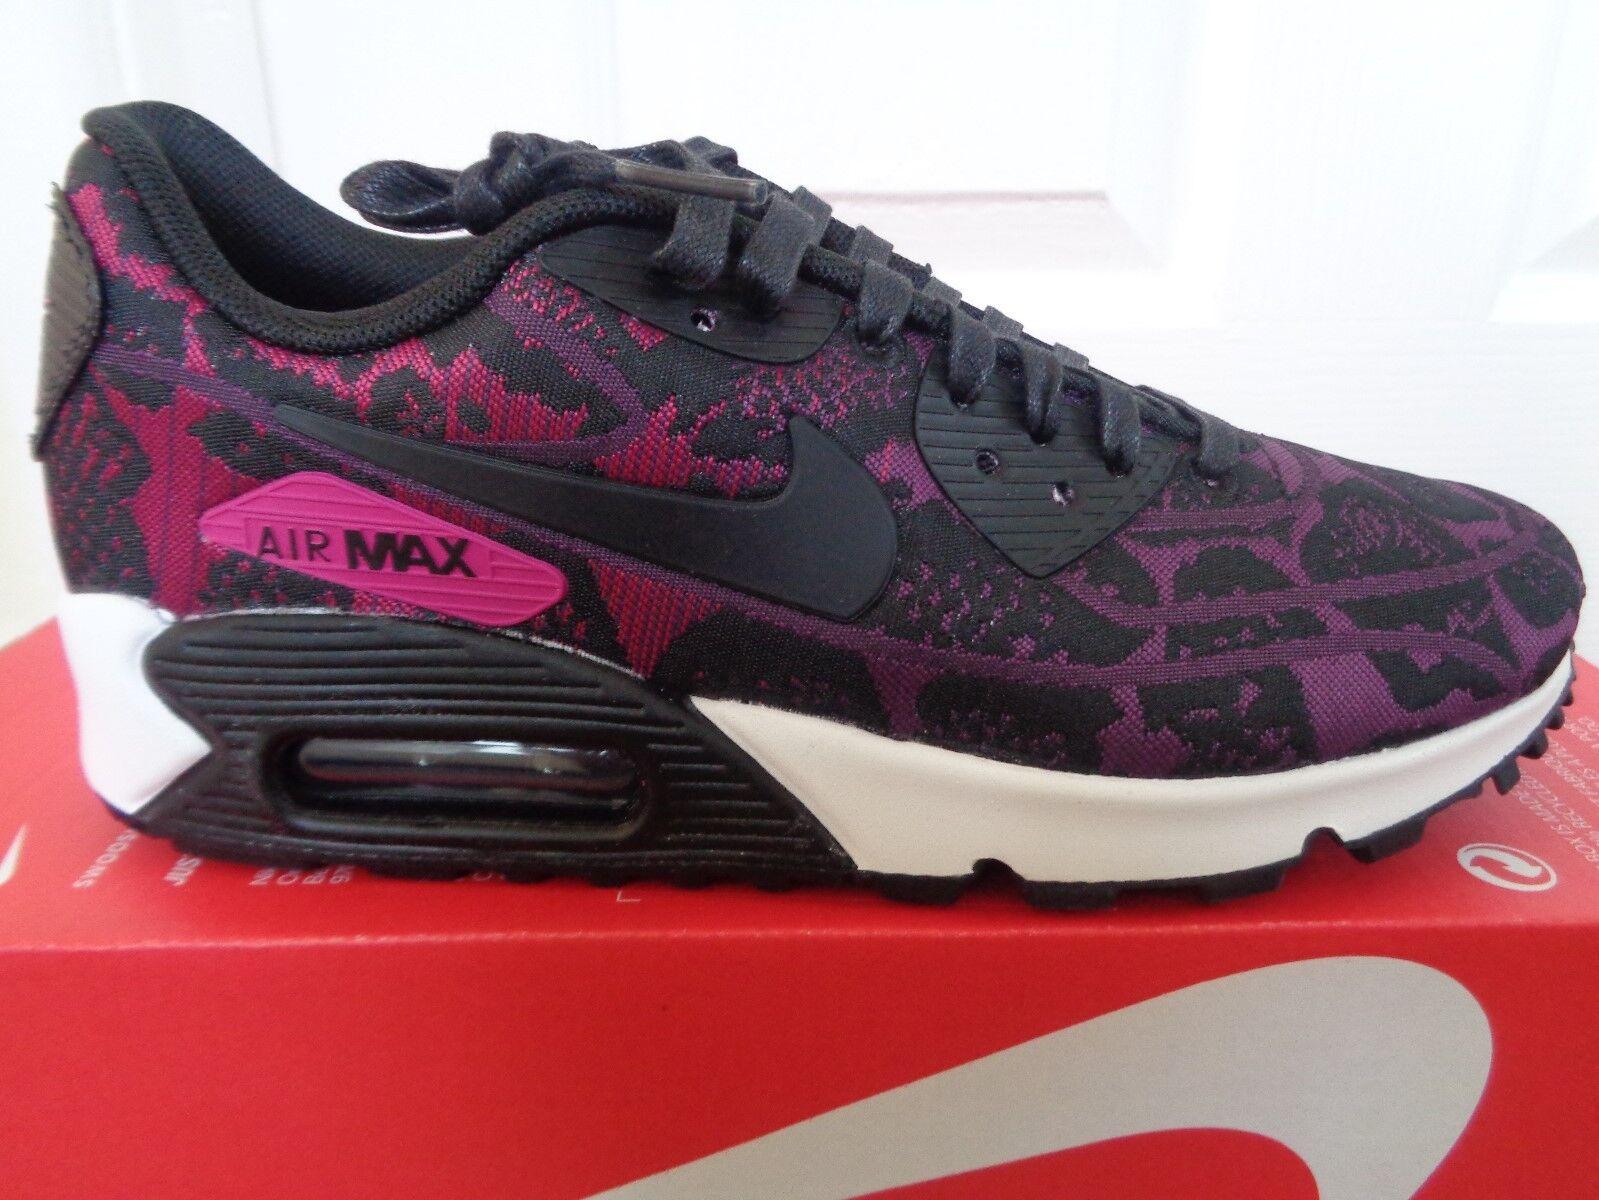 Nike Air max 90 749326 JCRD wmns trainers Turnschuhe 749326 90 500 uk 3 eu 36 us 5.5 NEW+BOX 73a262